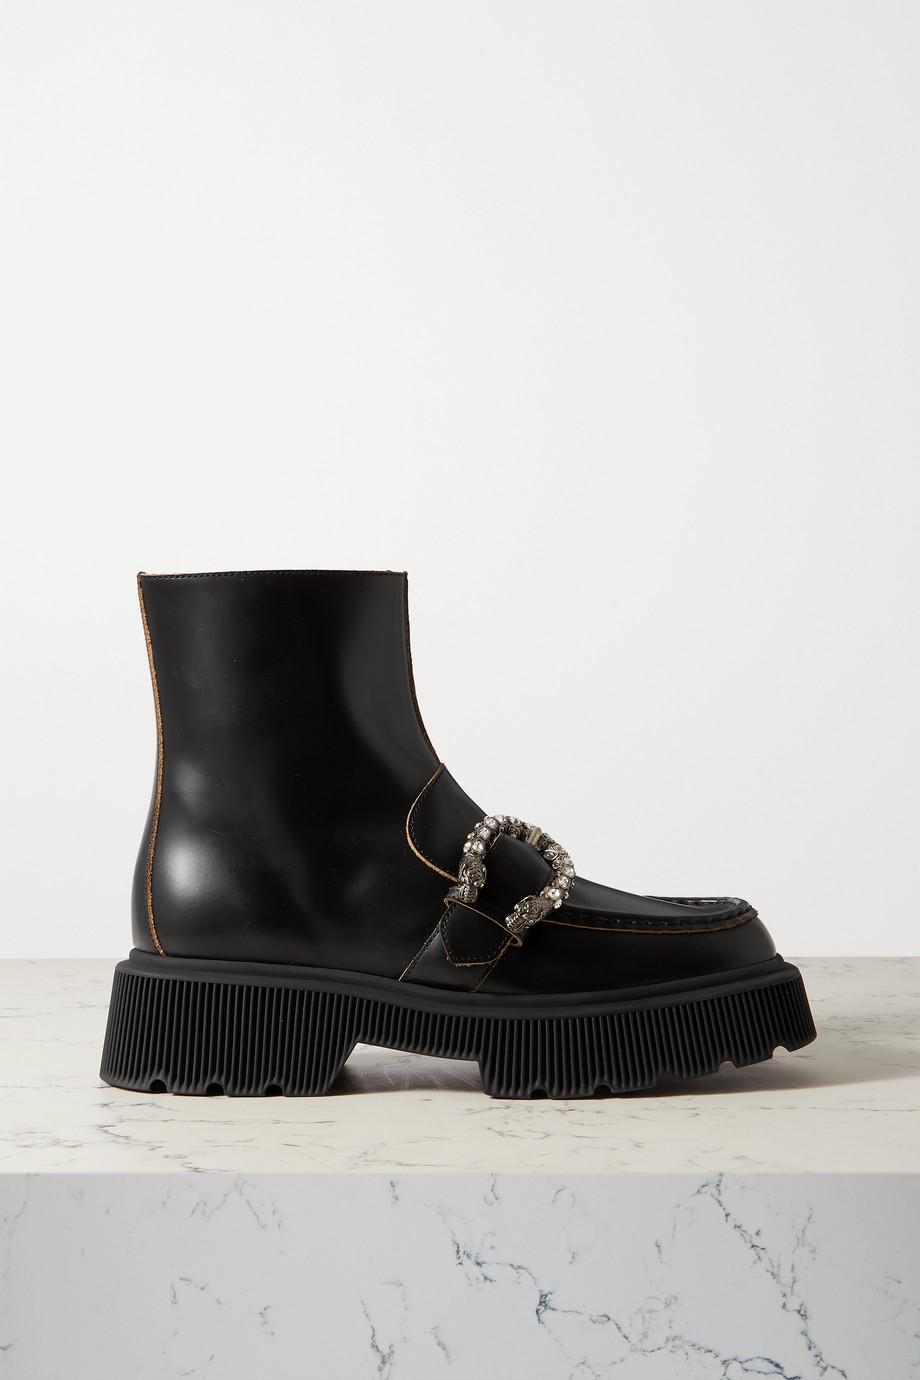 Gucci Hunder Plateaustiefel aus Leder mit Schnalle